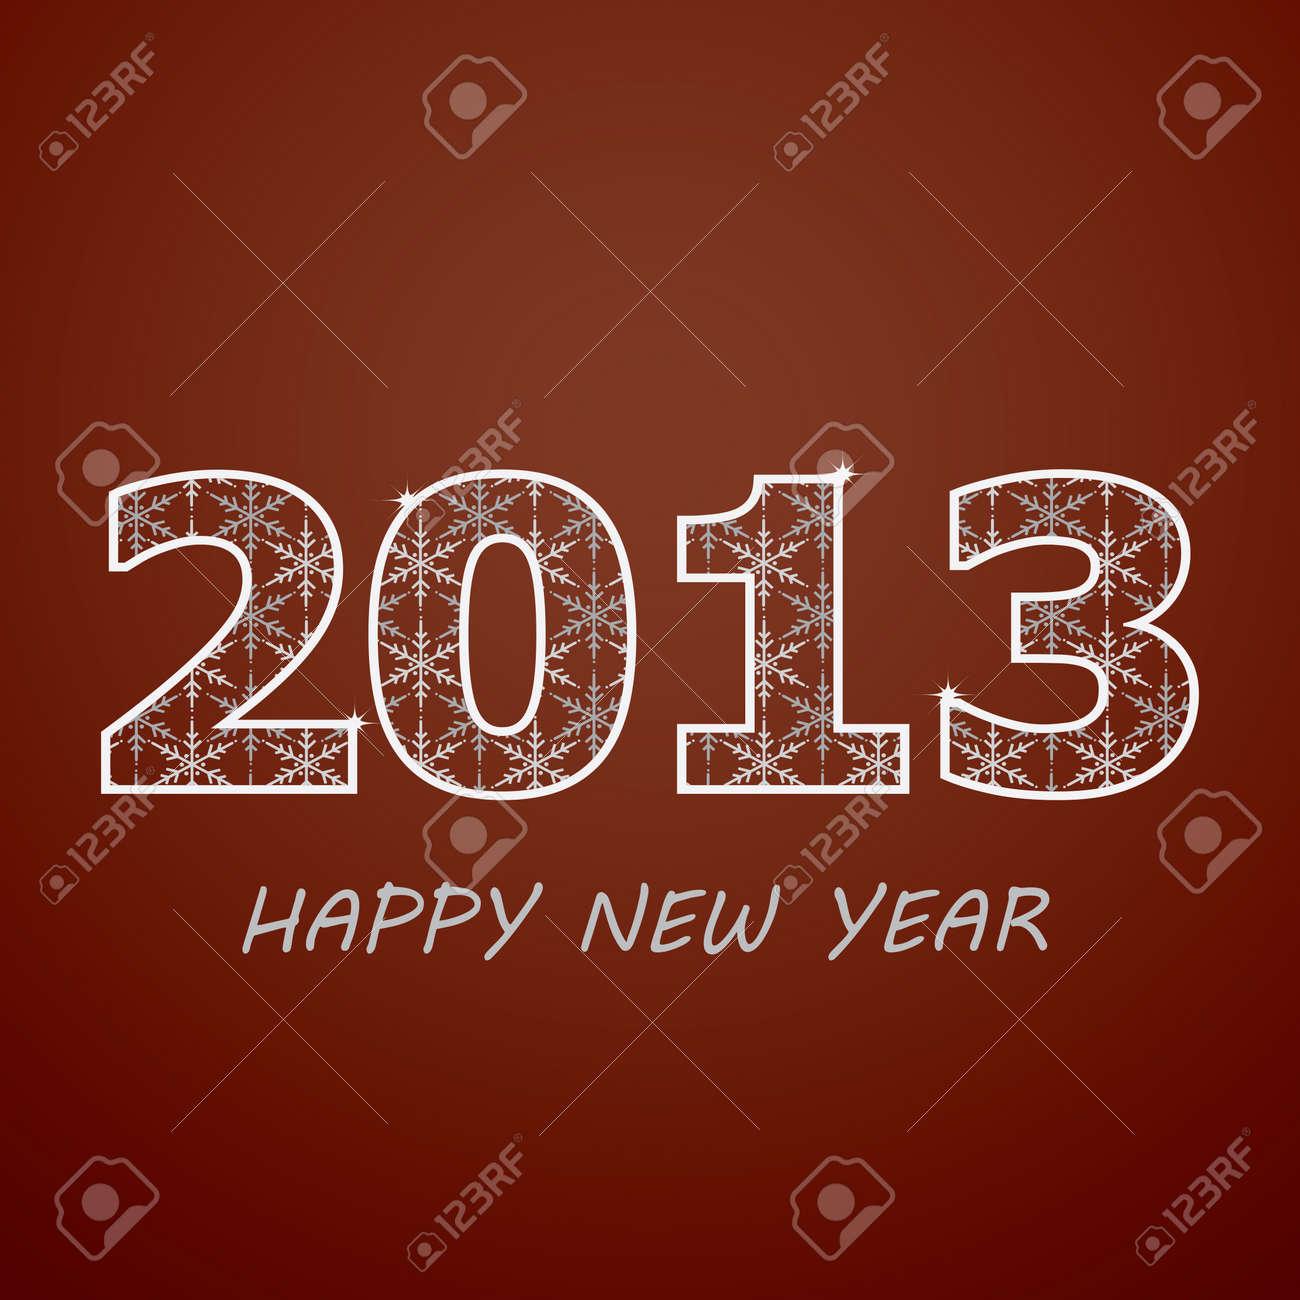 New year 2013 Stock Vector - 15260540